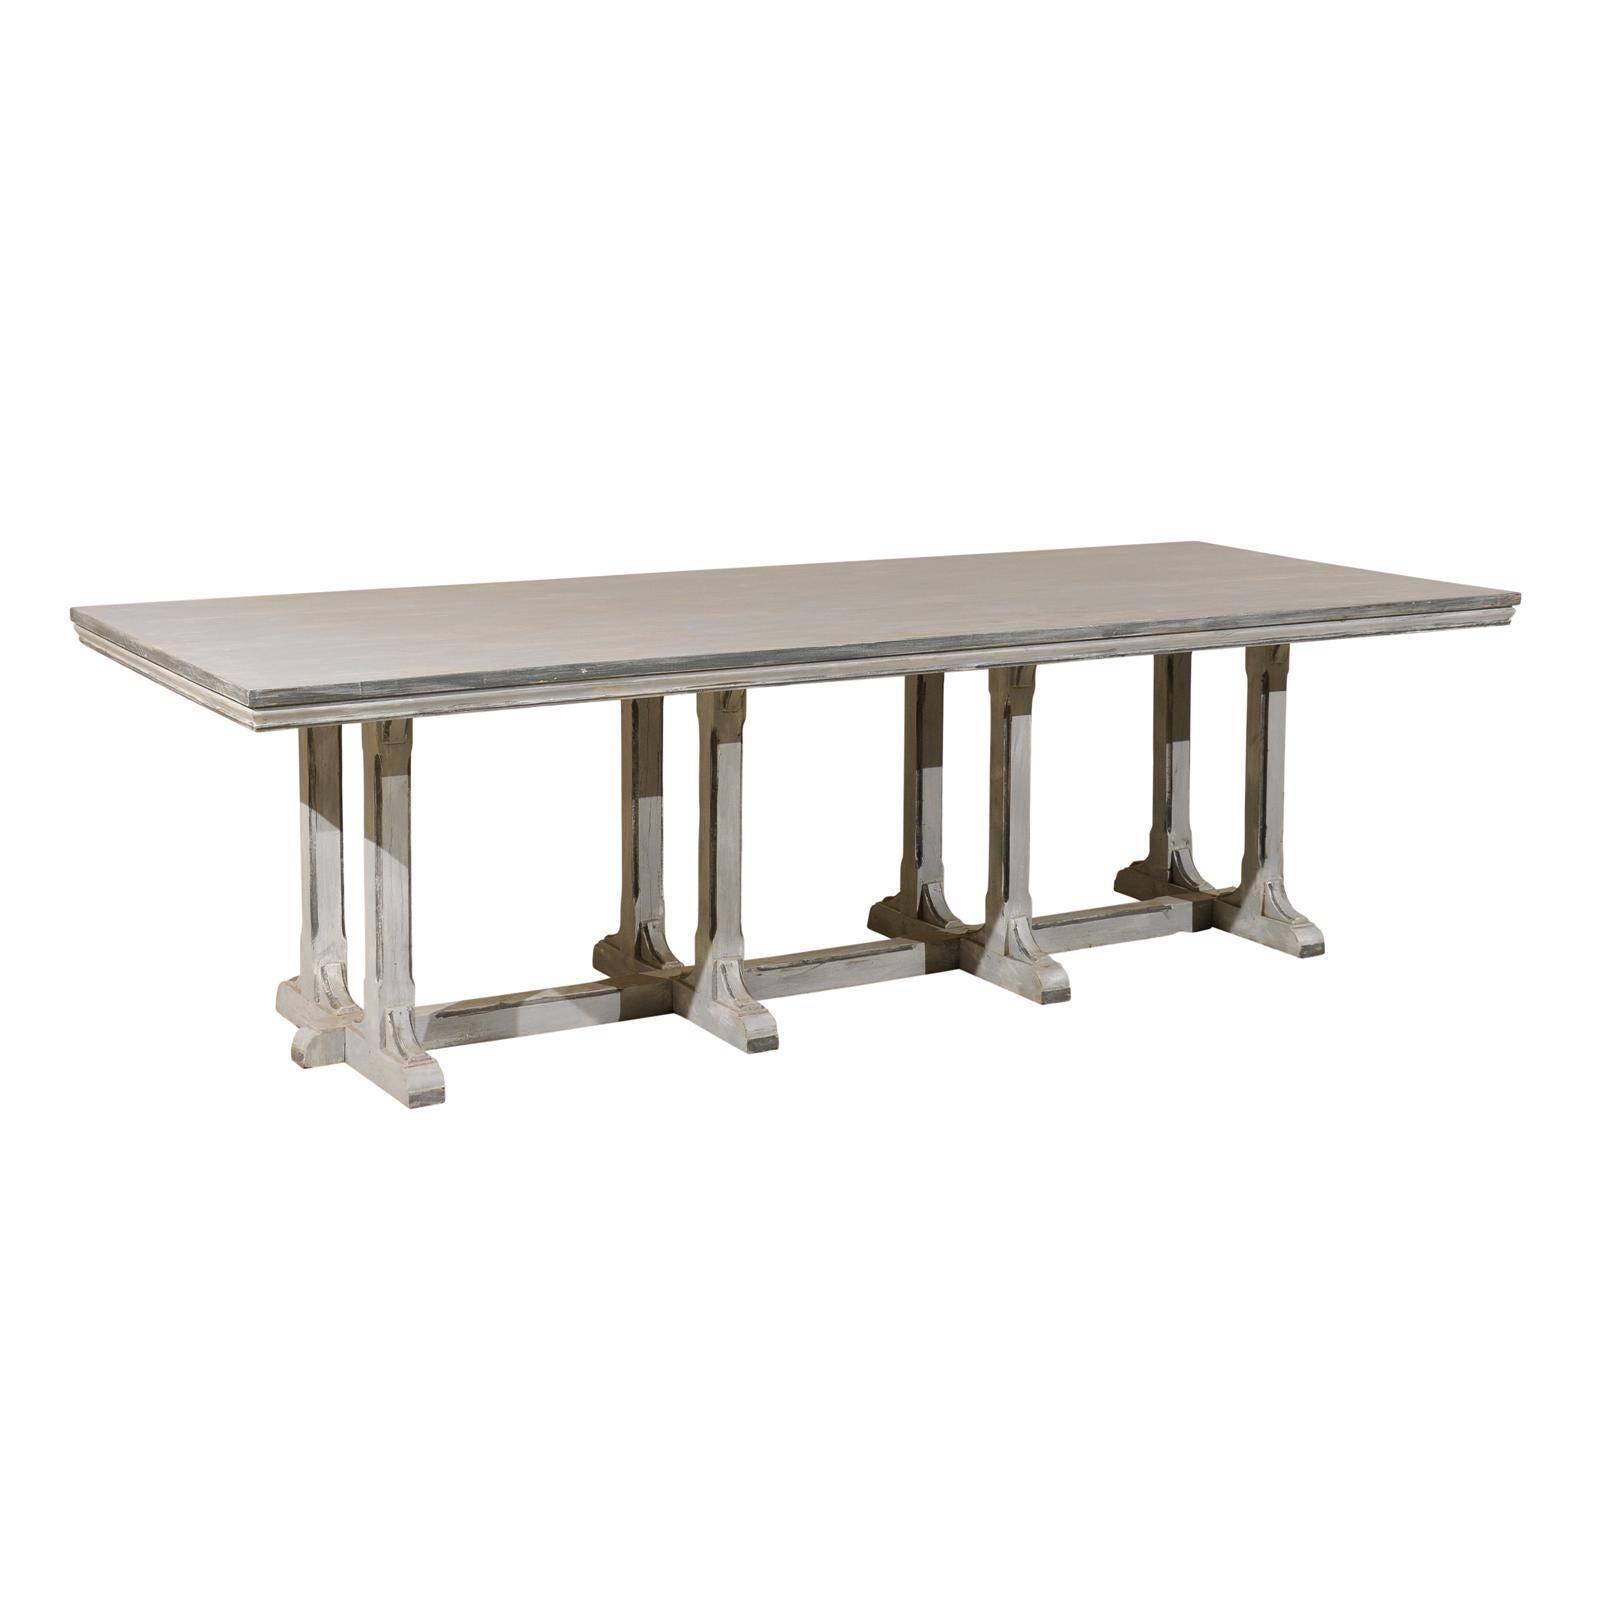 Large European Grey Painted Wood Rectangular Dining Table